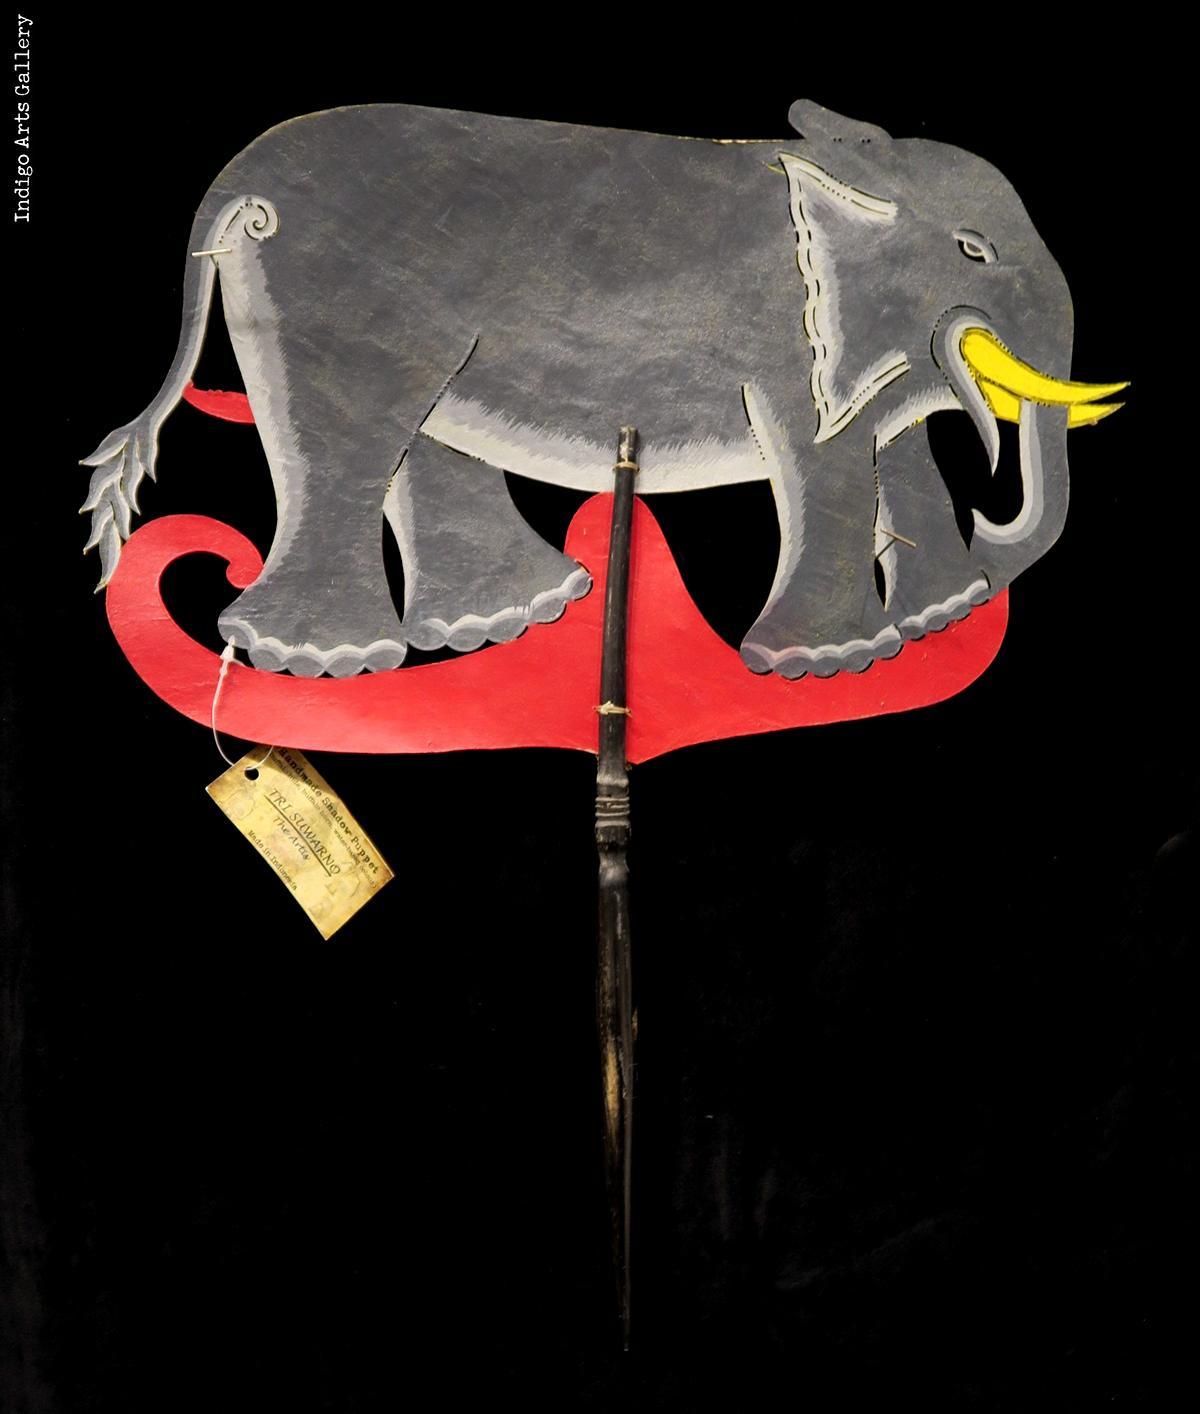 Gajah Elephant Wayang Kulit Javanese Shadow Puppet By Tri